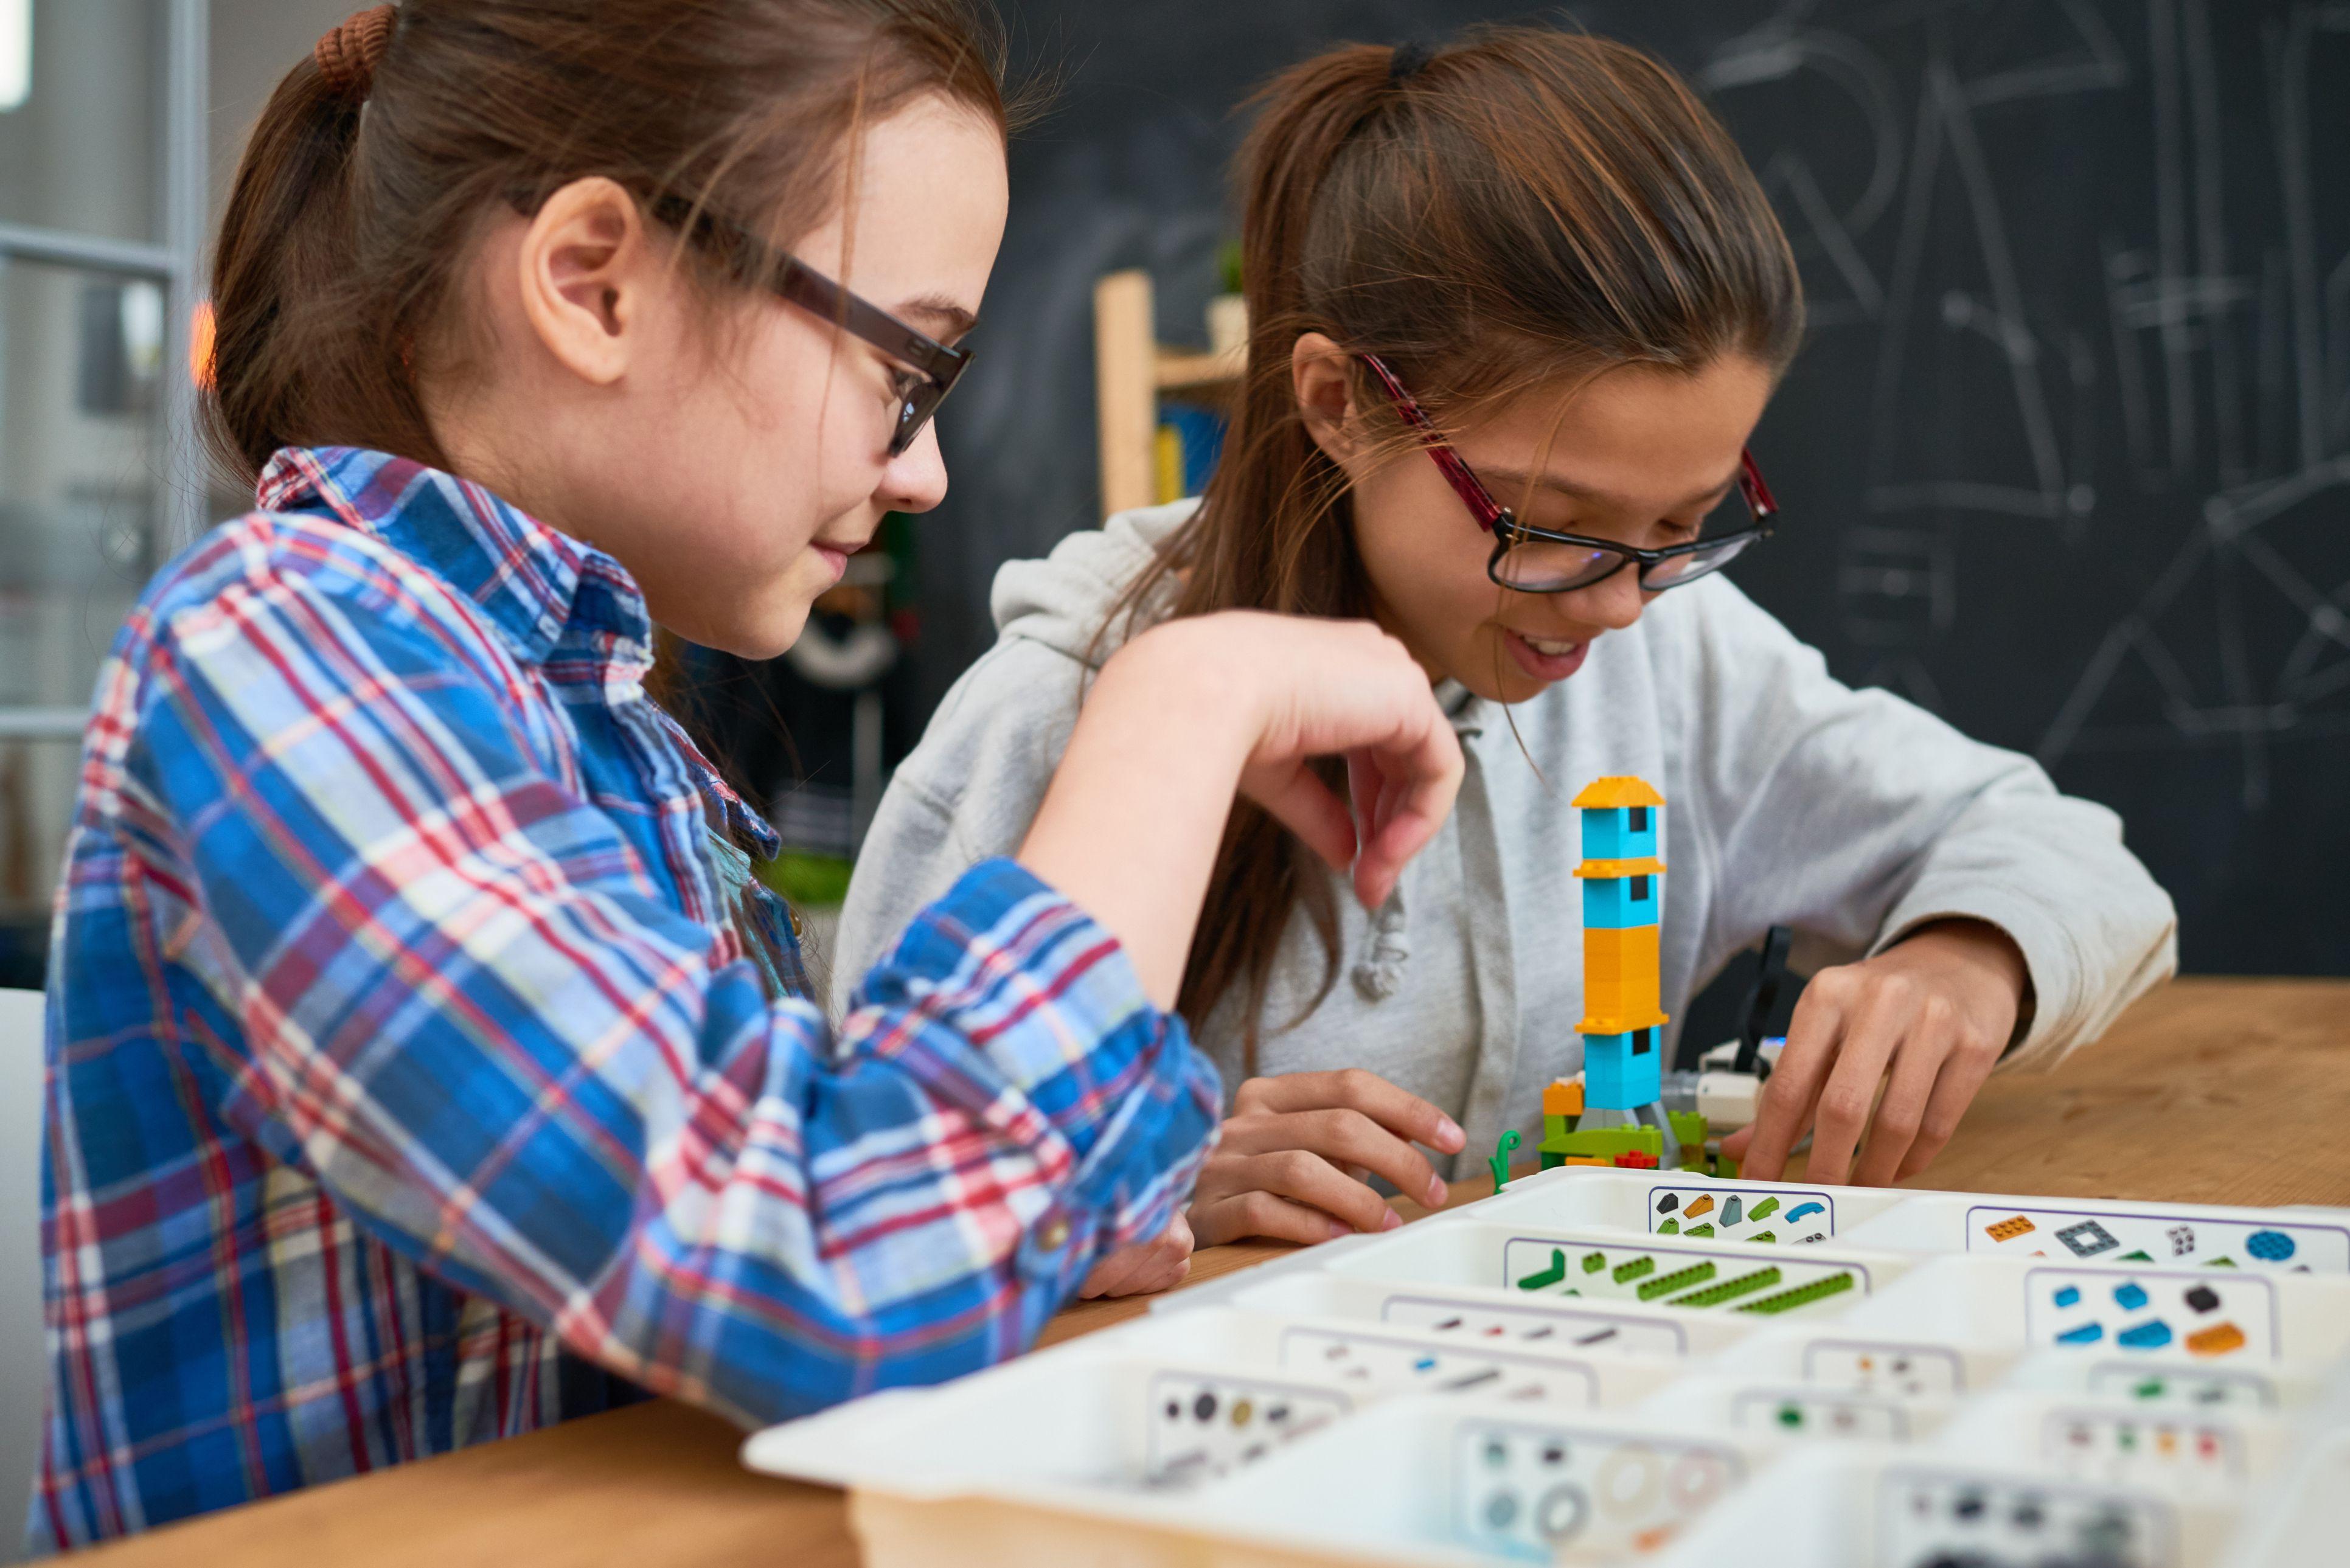 Intelligent girls making tower from building blocks